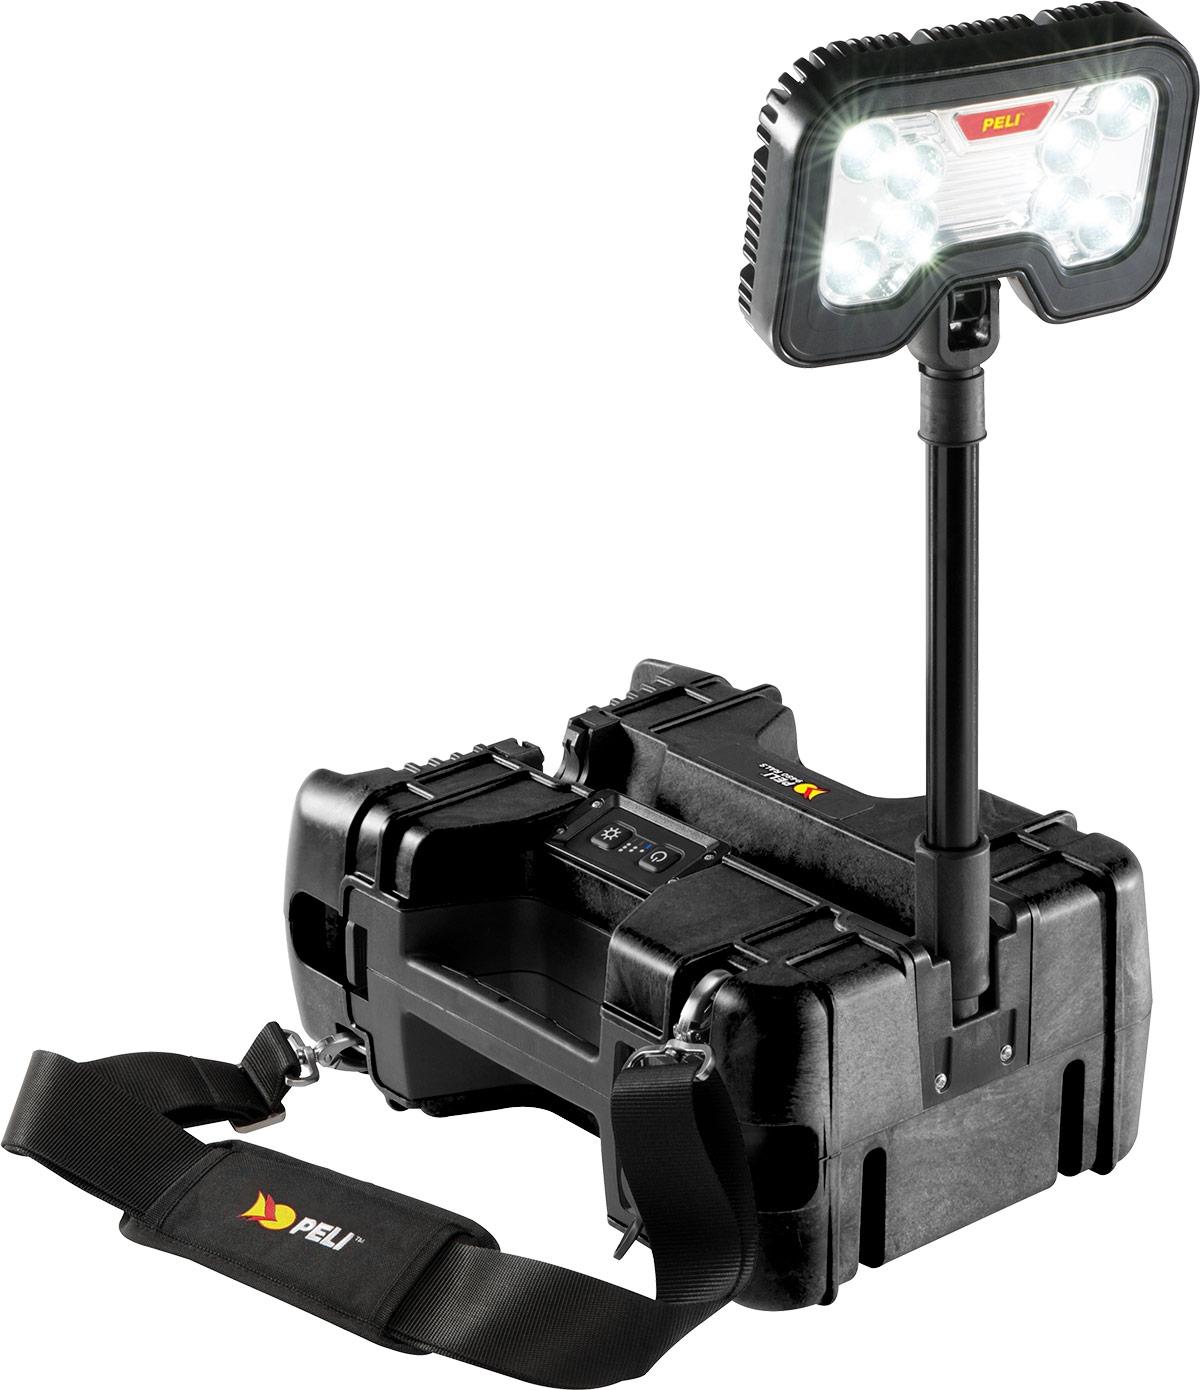 peli 9480 portable remote area light